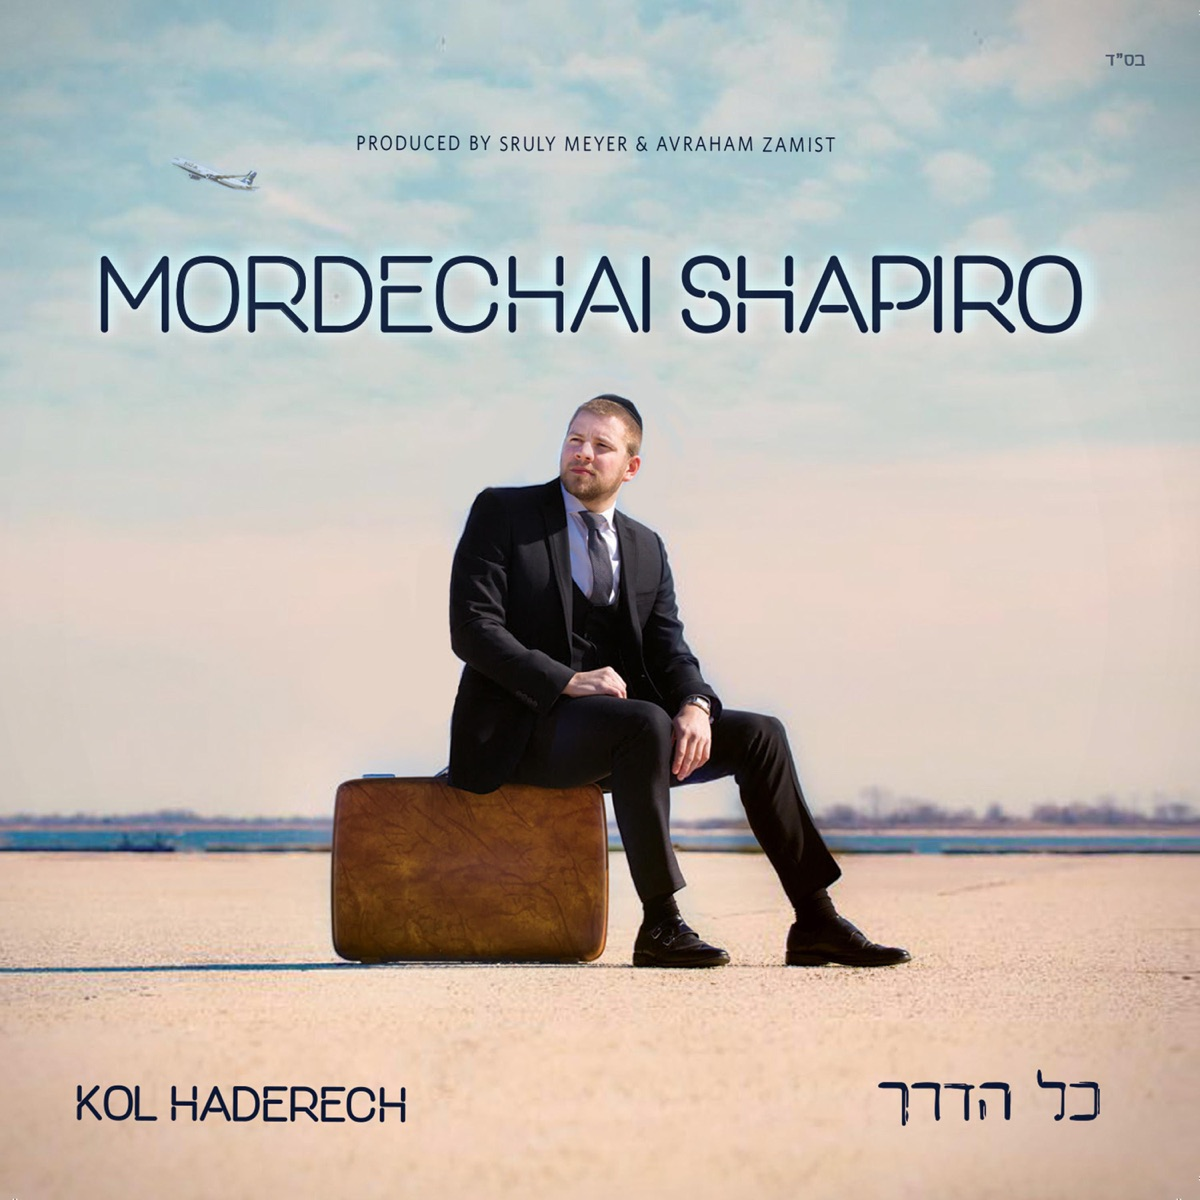 Kol Haderech Mordechai Shapiro CD cover